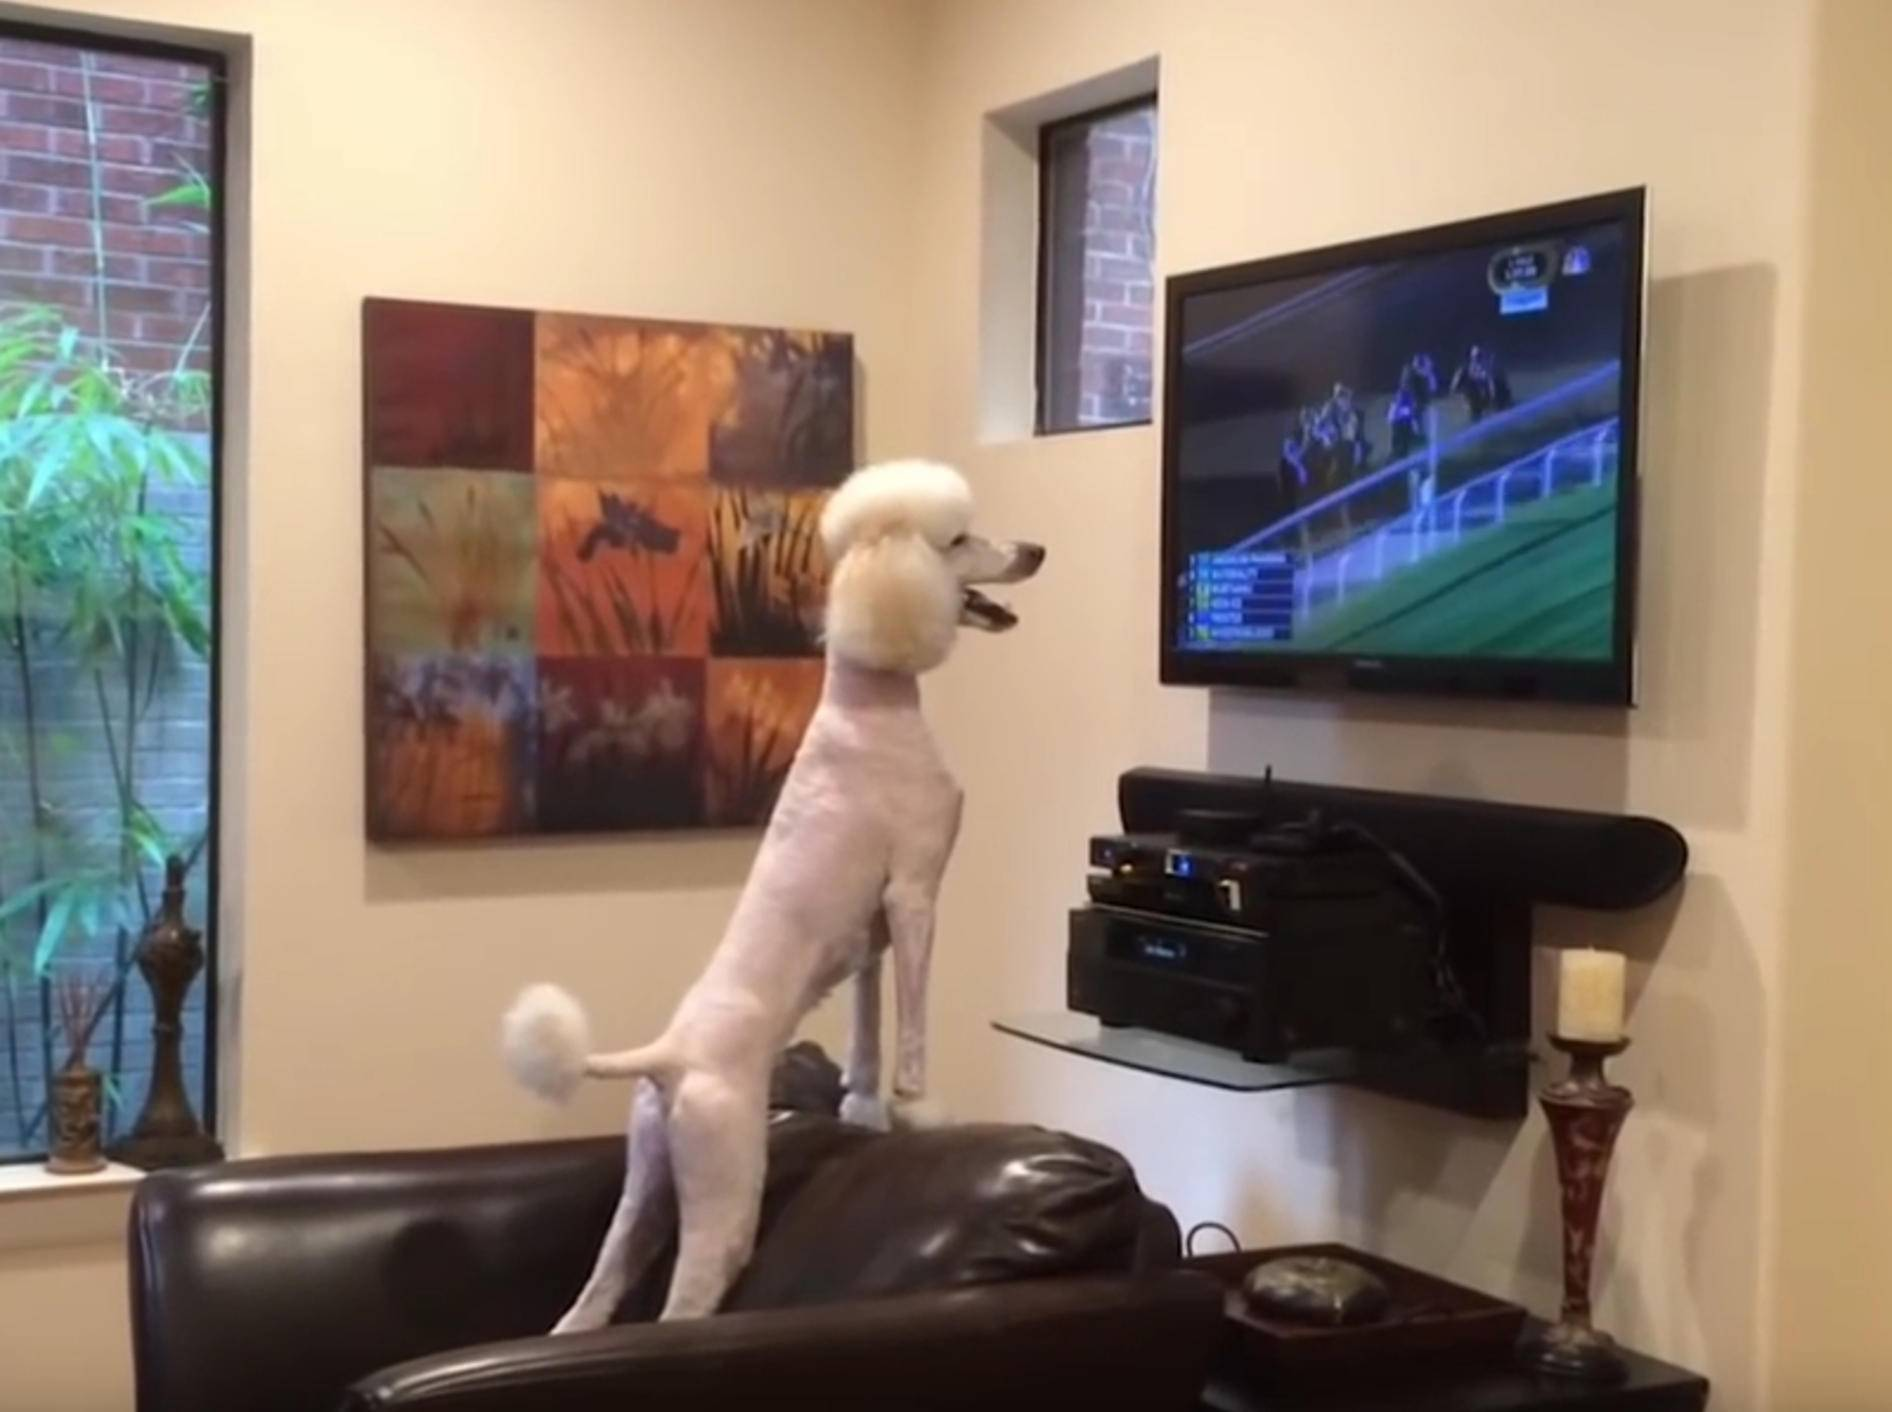 Wuff-wuff! Pudel feuert Pferde beim Rennen an – Bild: YouTube / CutiesNFuzzies